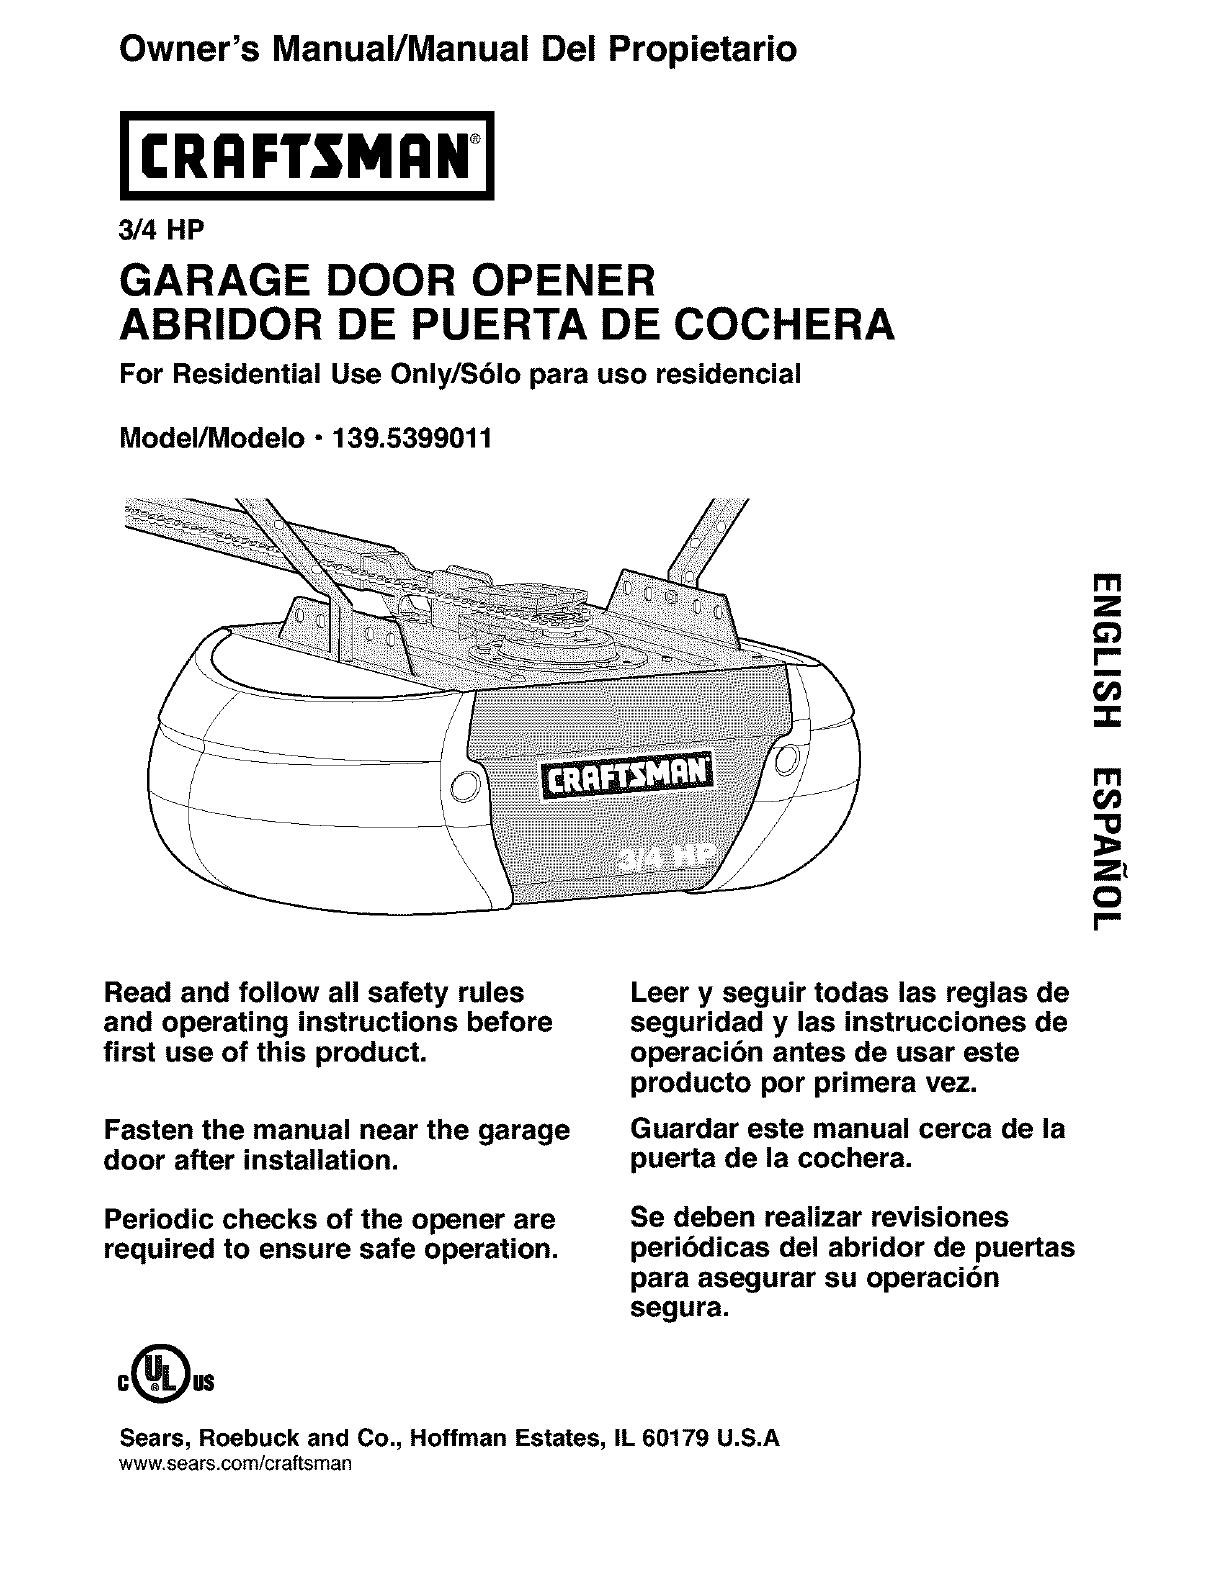 Craftsman 1395399011 User Manual Garage Door Opener Manuals And Guides L0403214